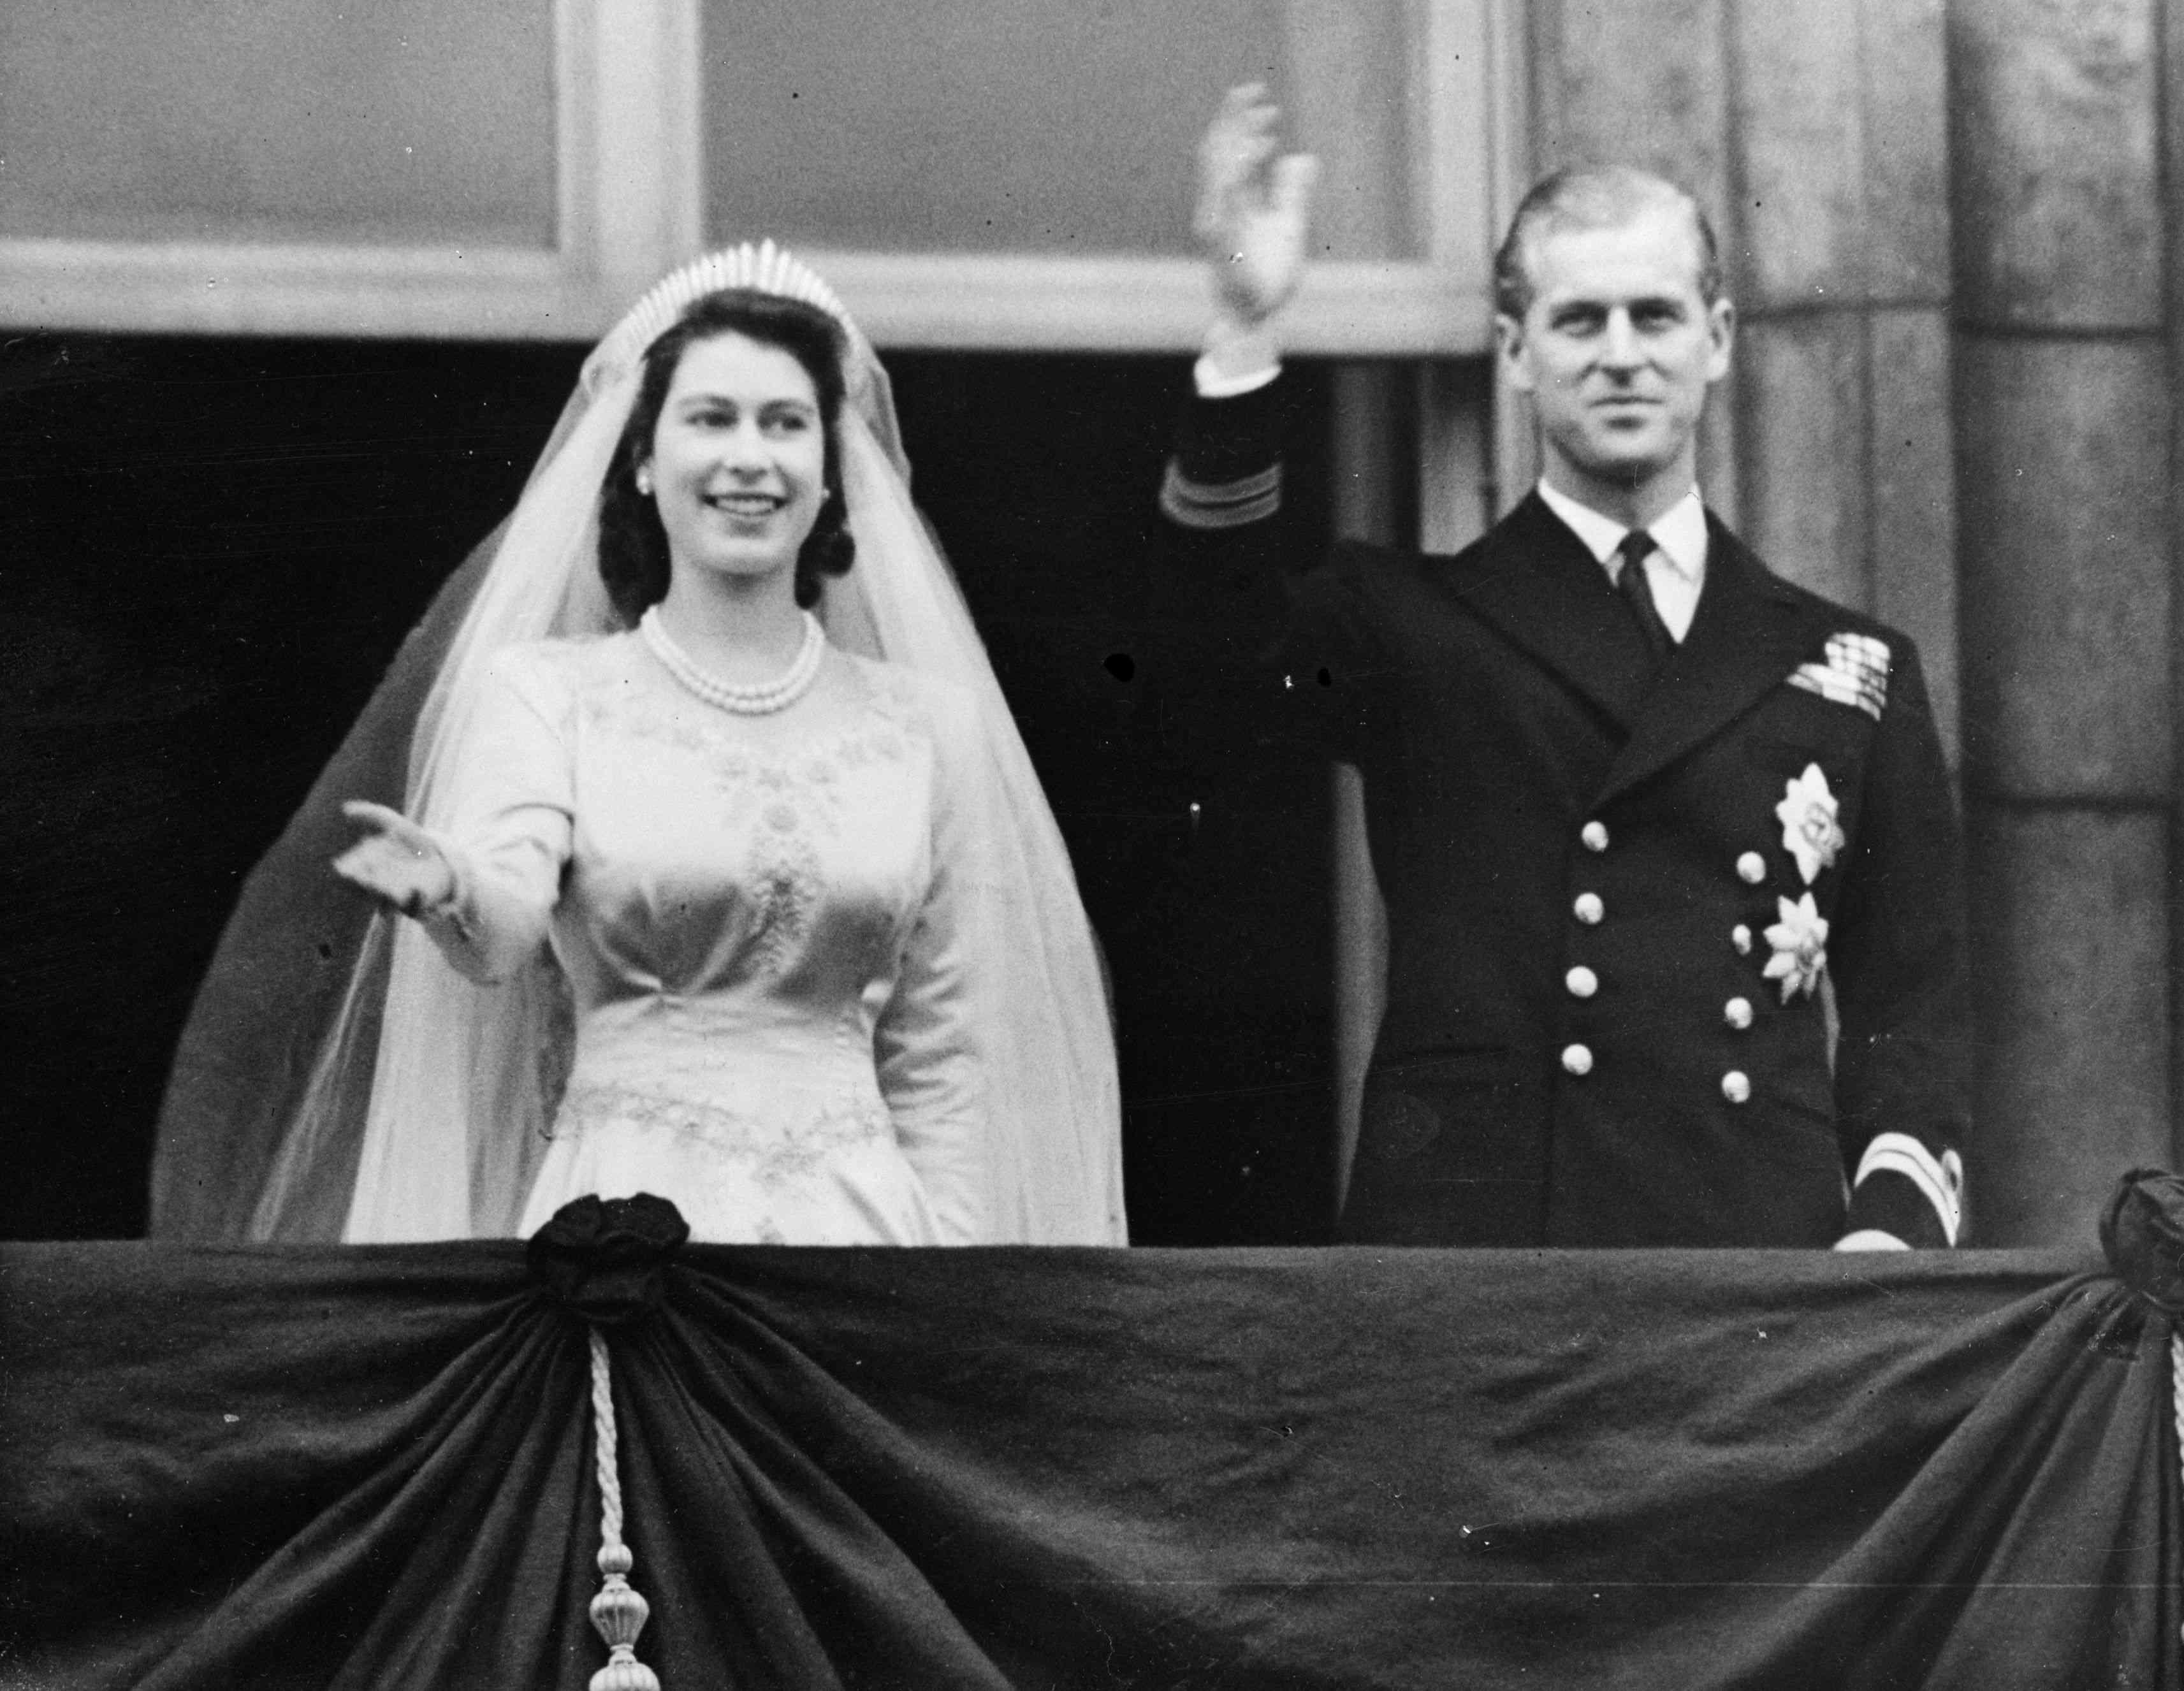 Princess Elizabeth and The Prince Philip, Duke of Edinburgh